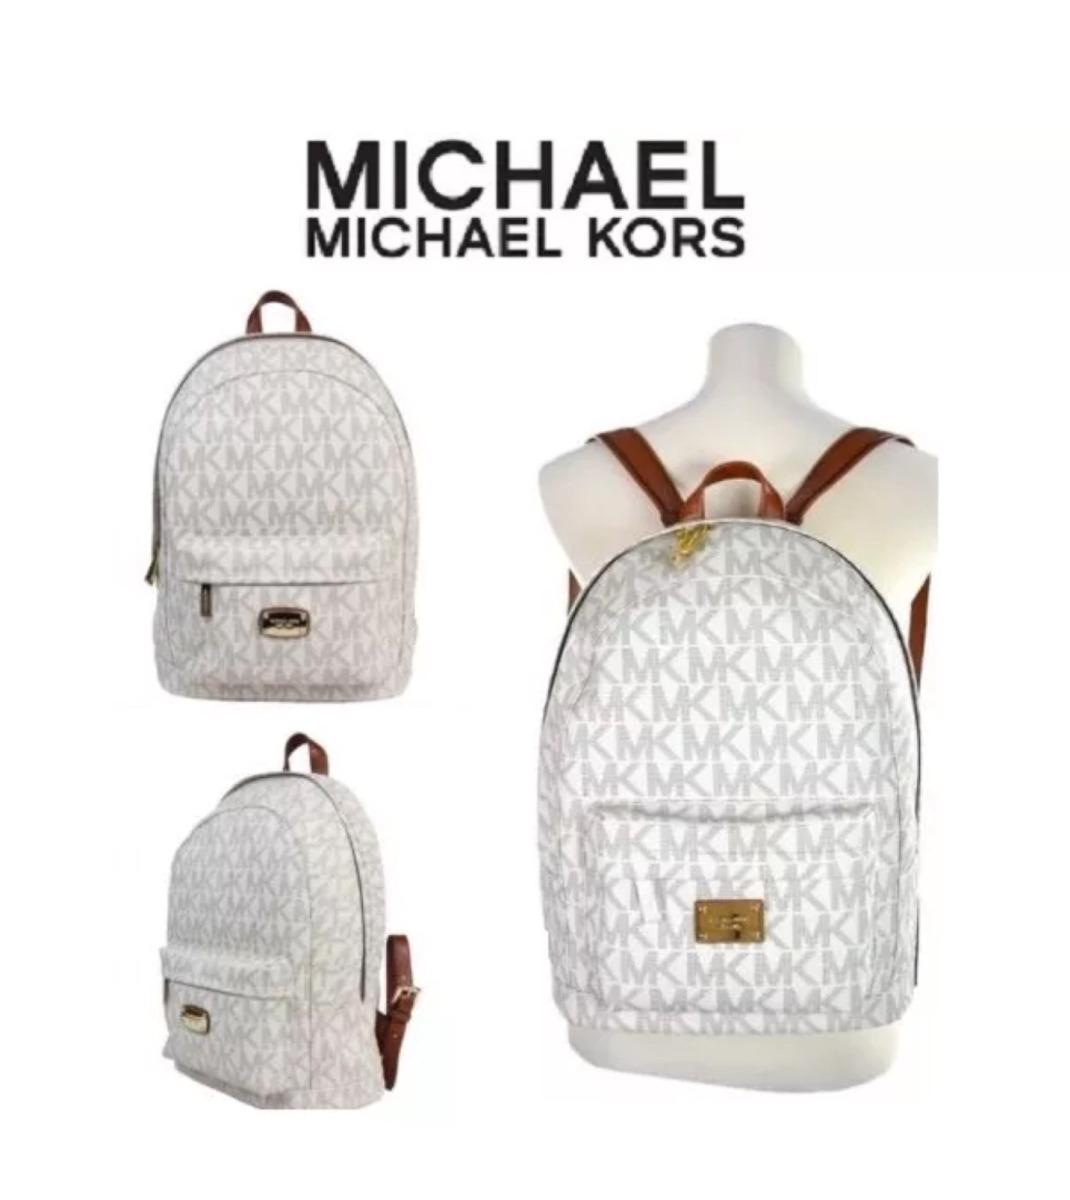 Mochilas Michael Kors Mercadolibre